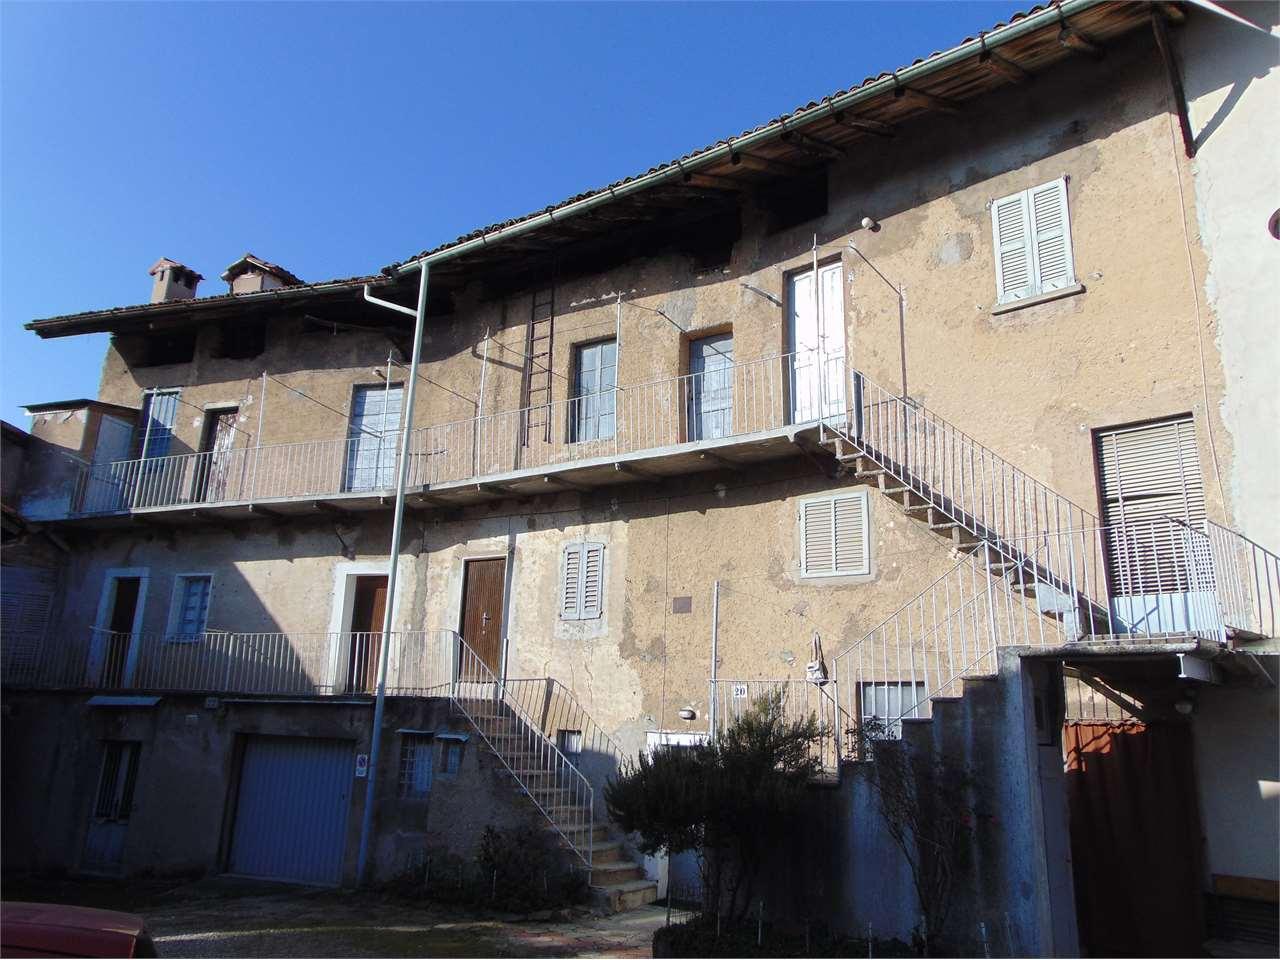 Rustico / Casale in Vendita a Varese